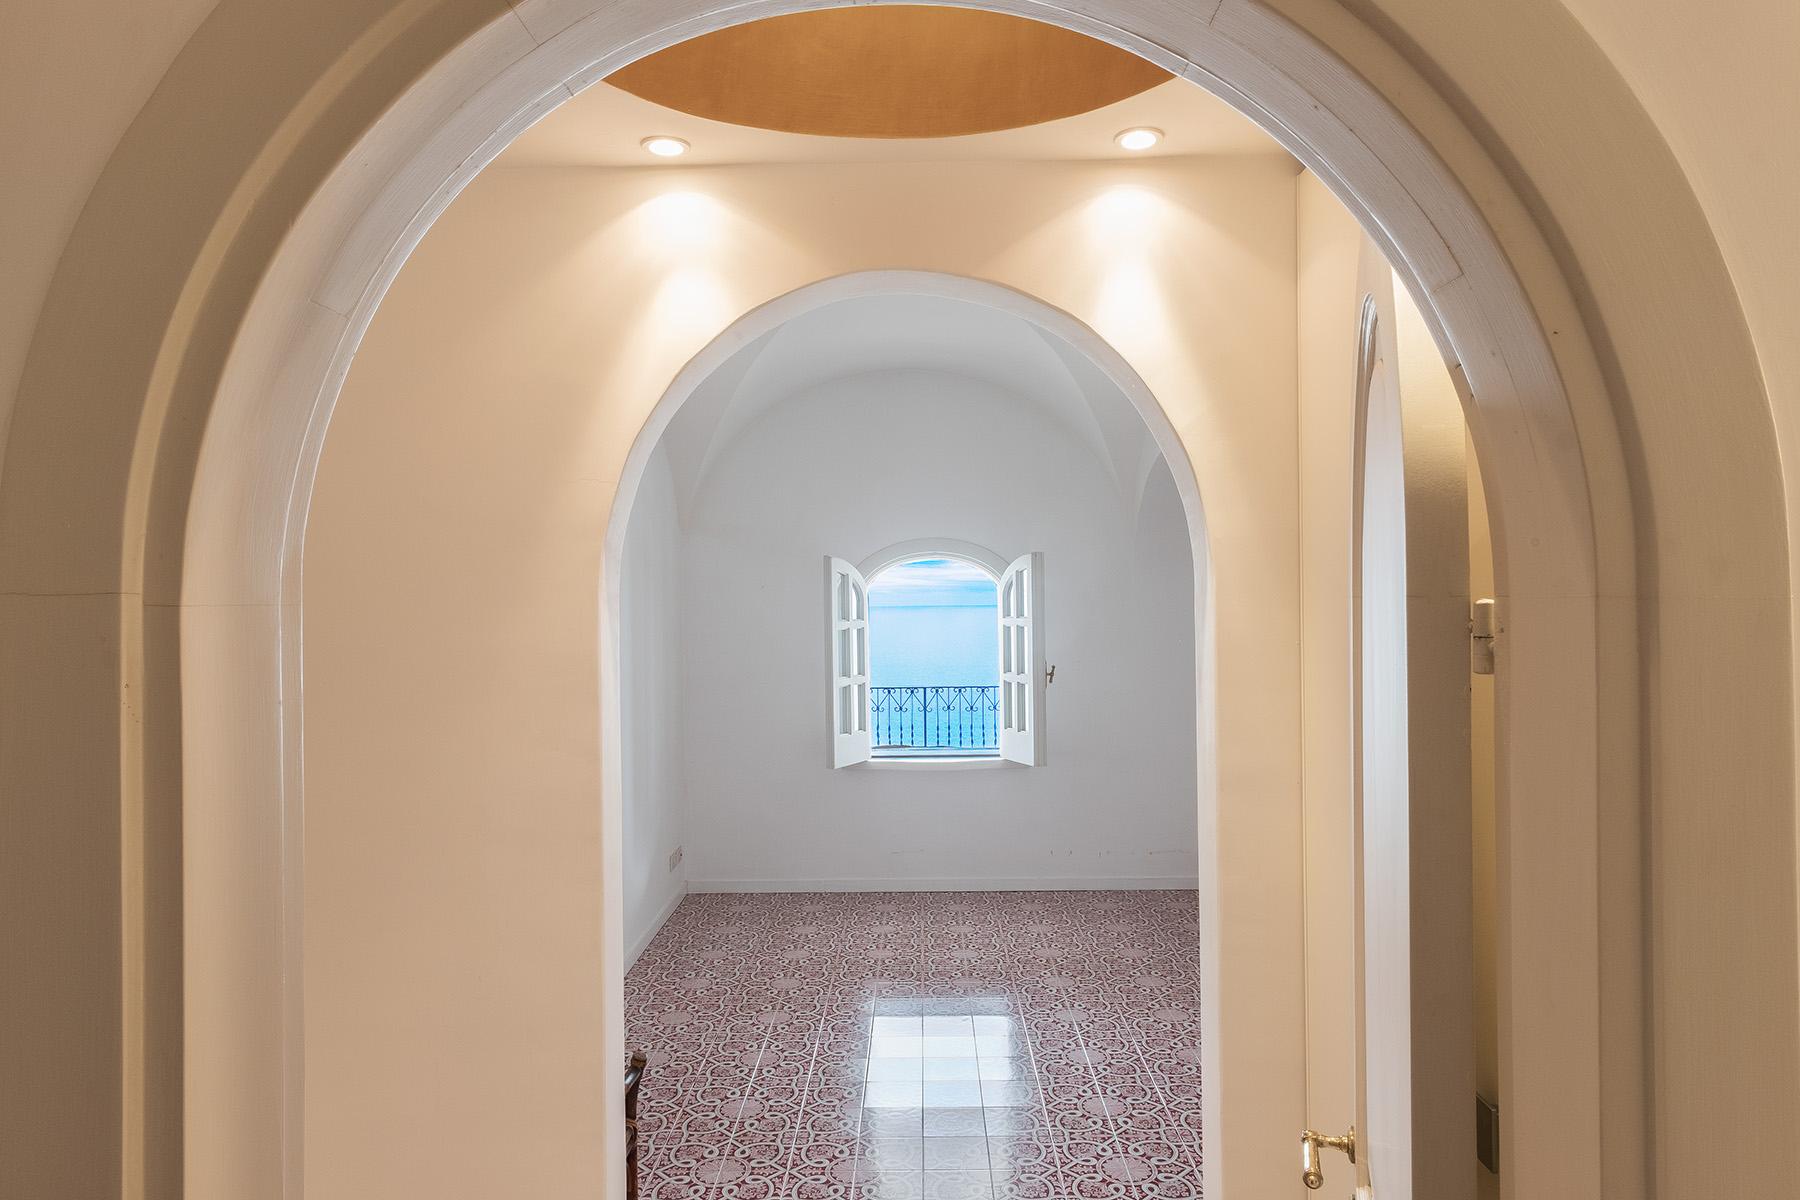 Casa indipendente in Vendita a Praiano: 4 locali, 250 mq - Foto 11